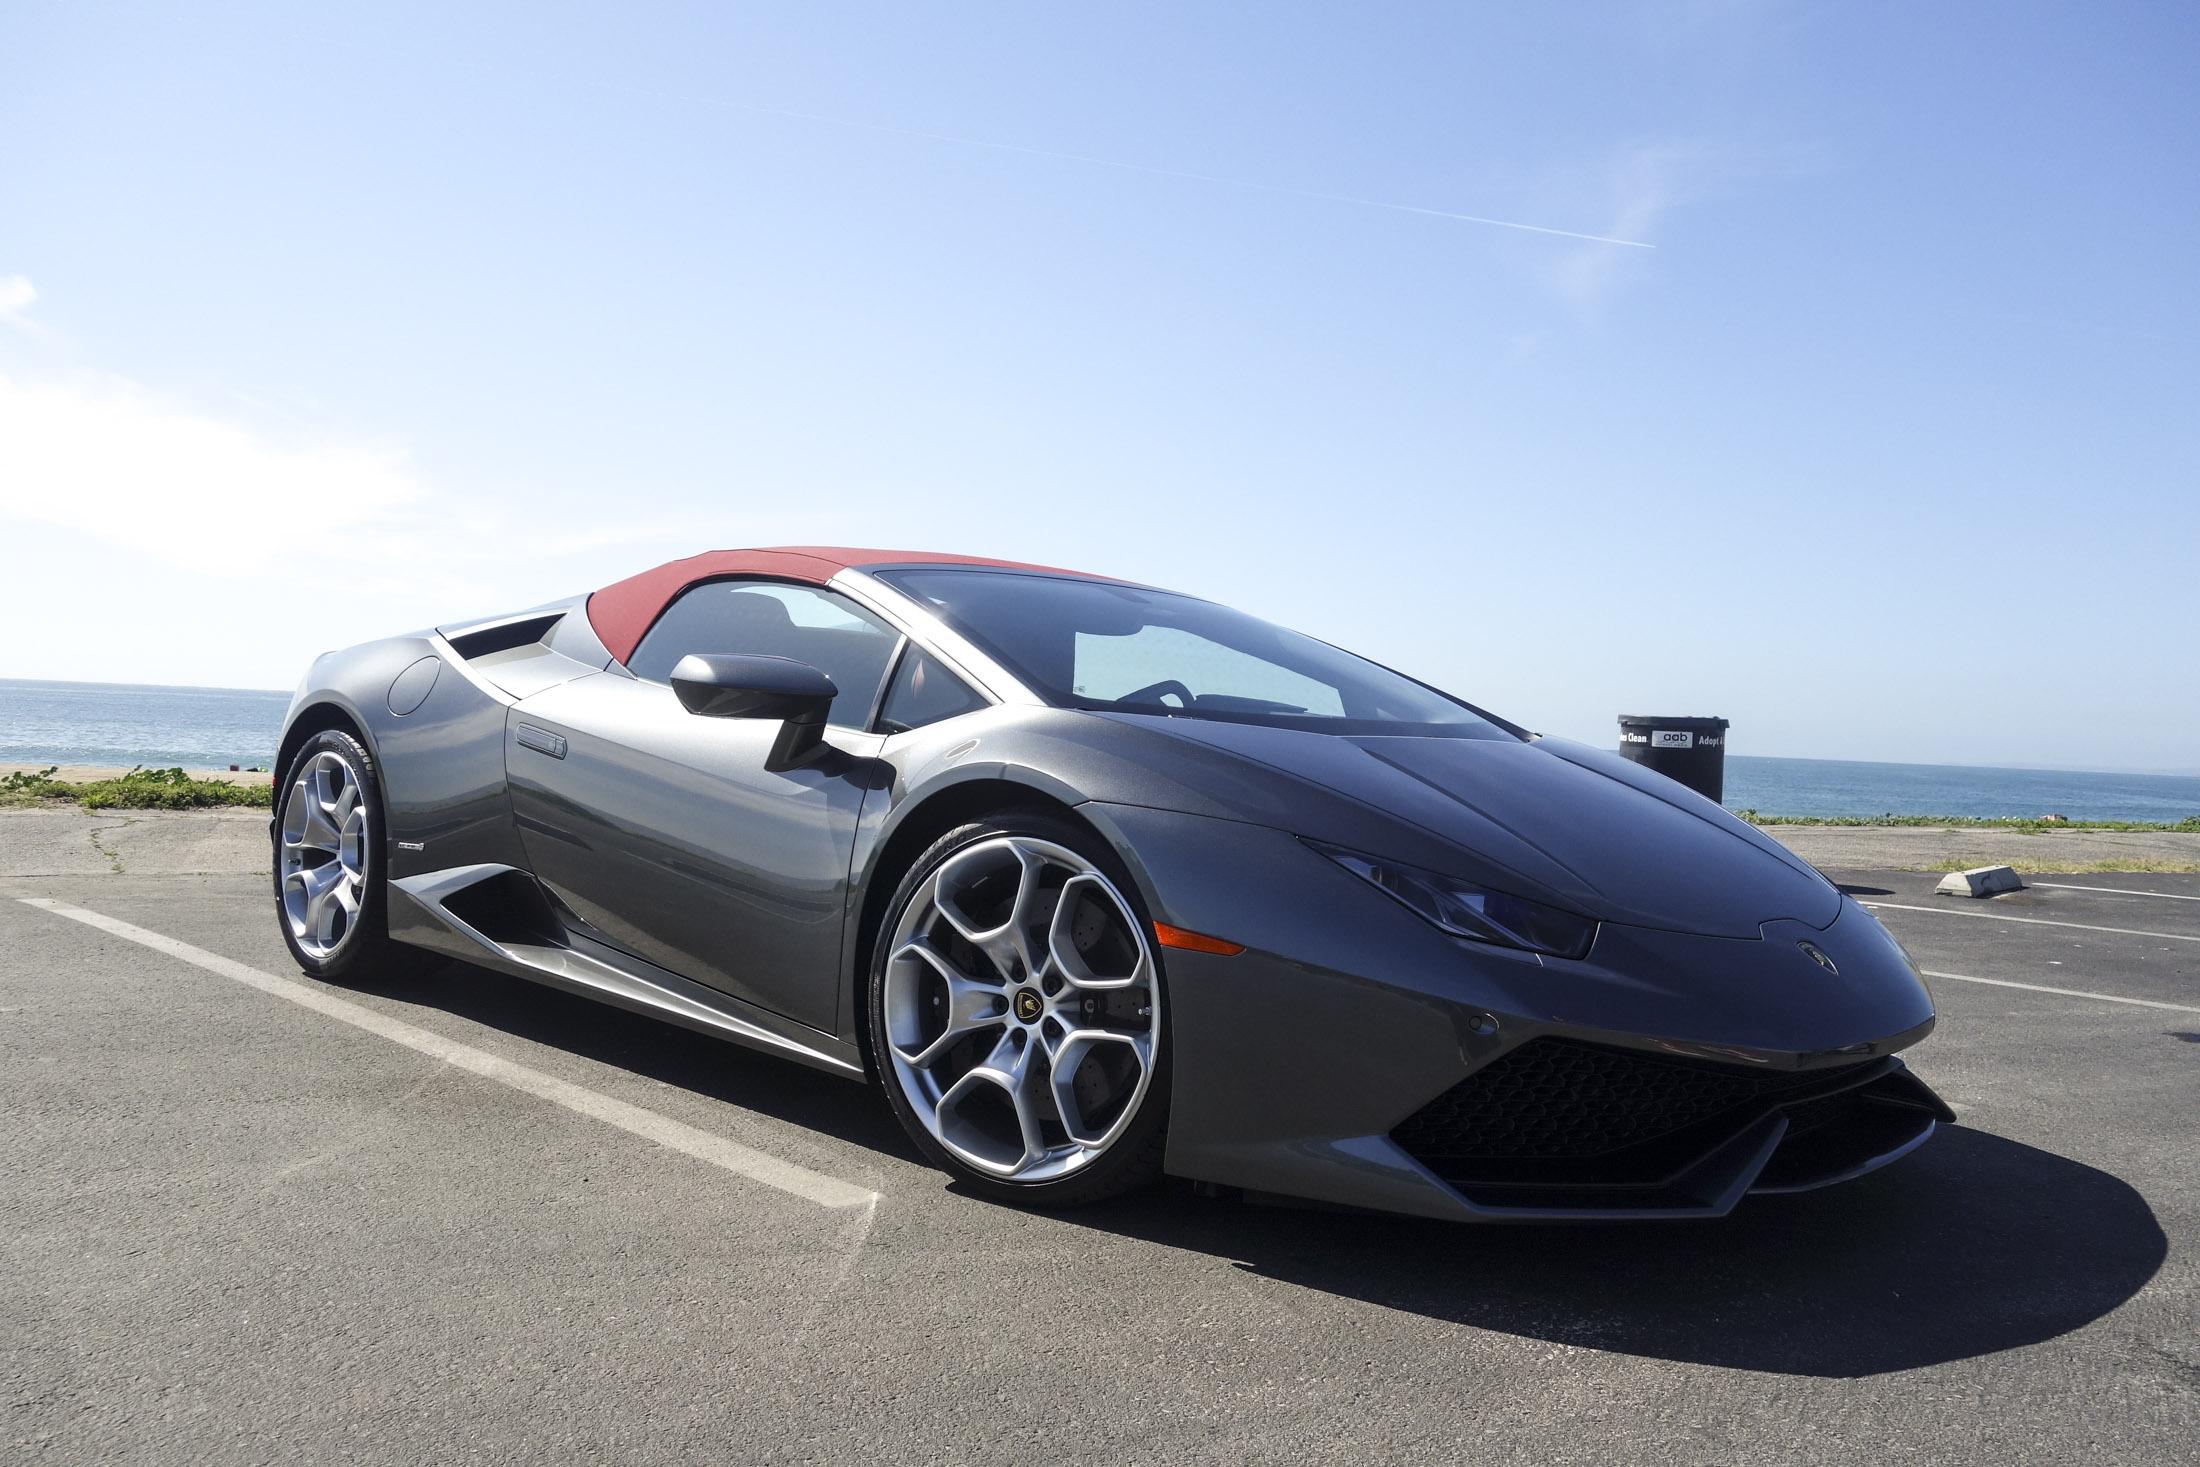 The Sexiest Drop-Top: Lamborghini Huracán Spyder